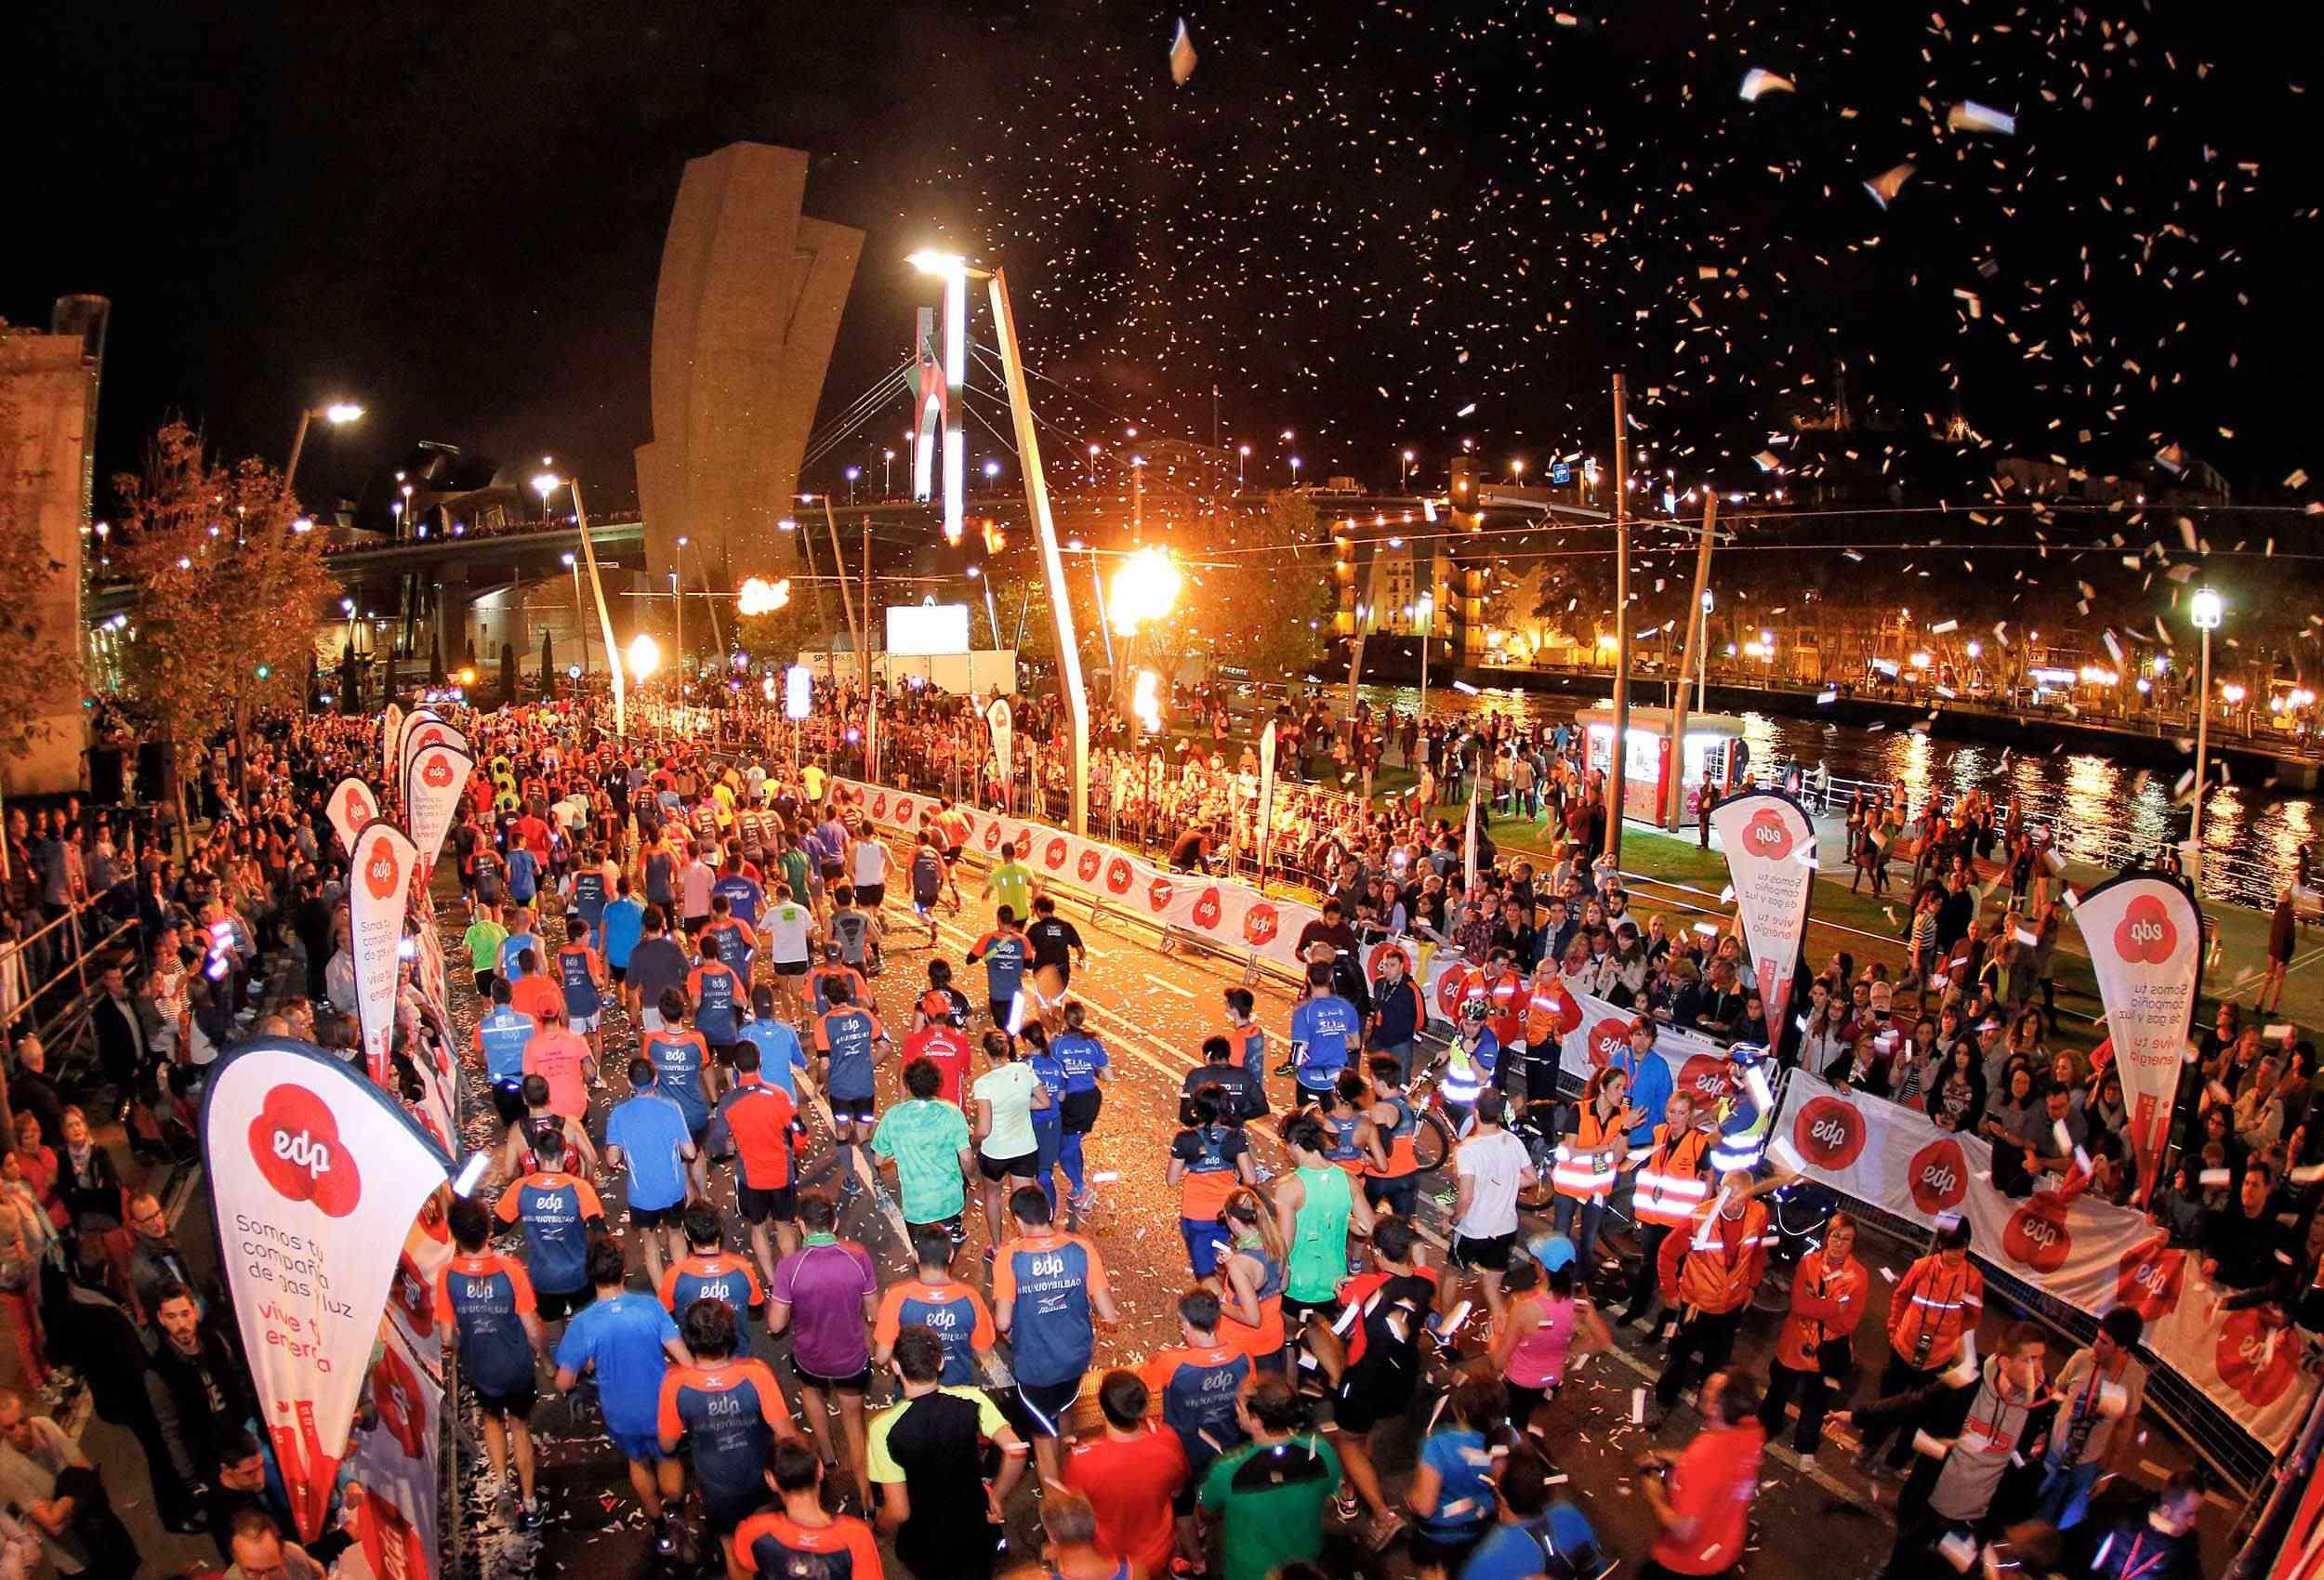 Bilbao Bizkaia Night Marathon